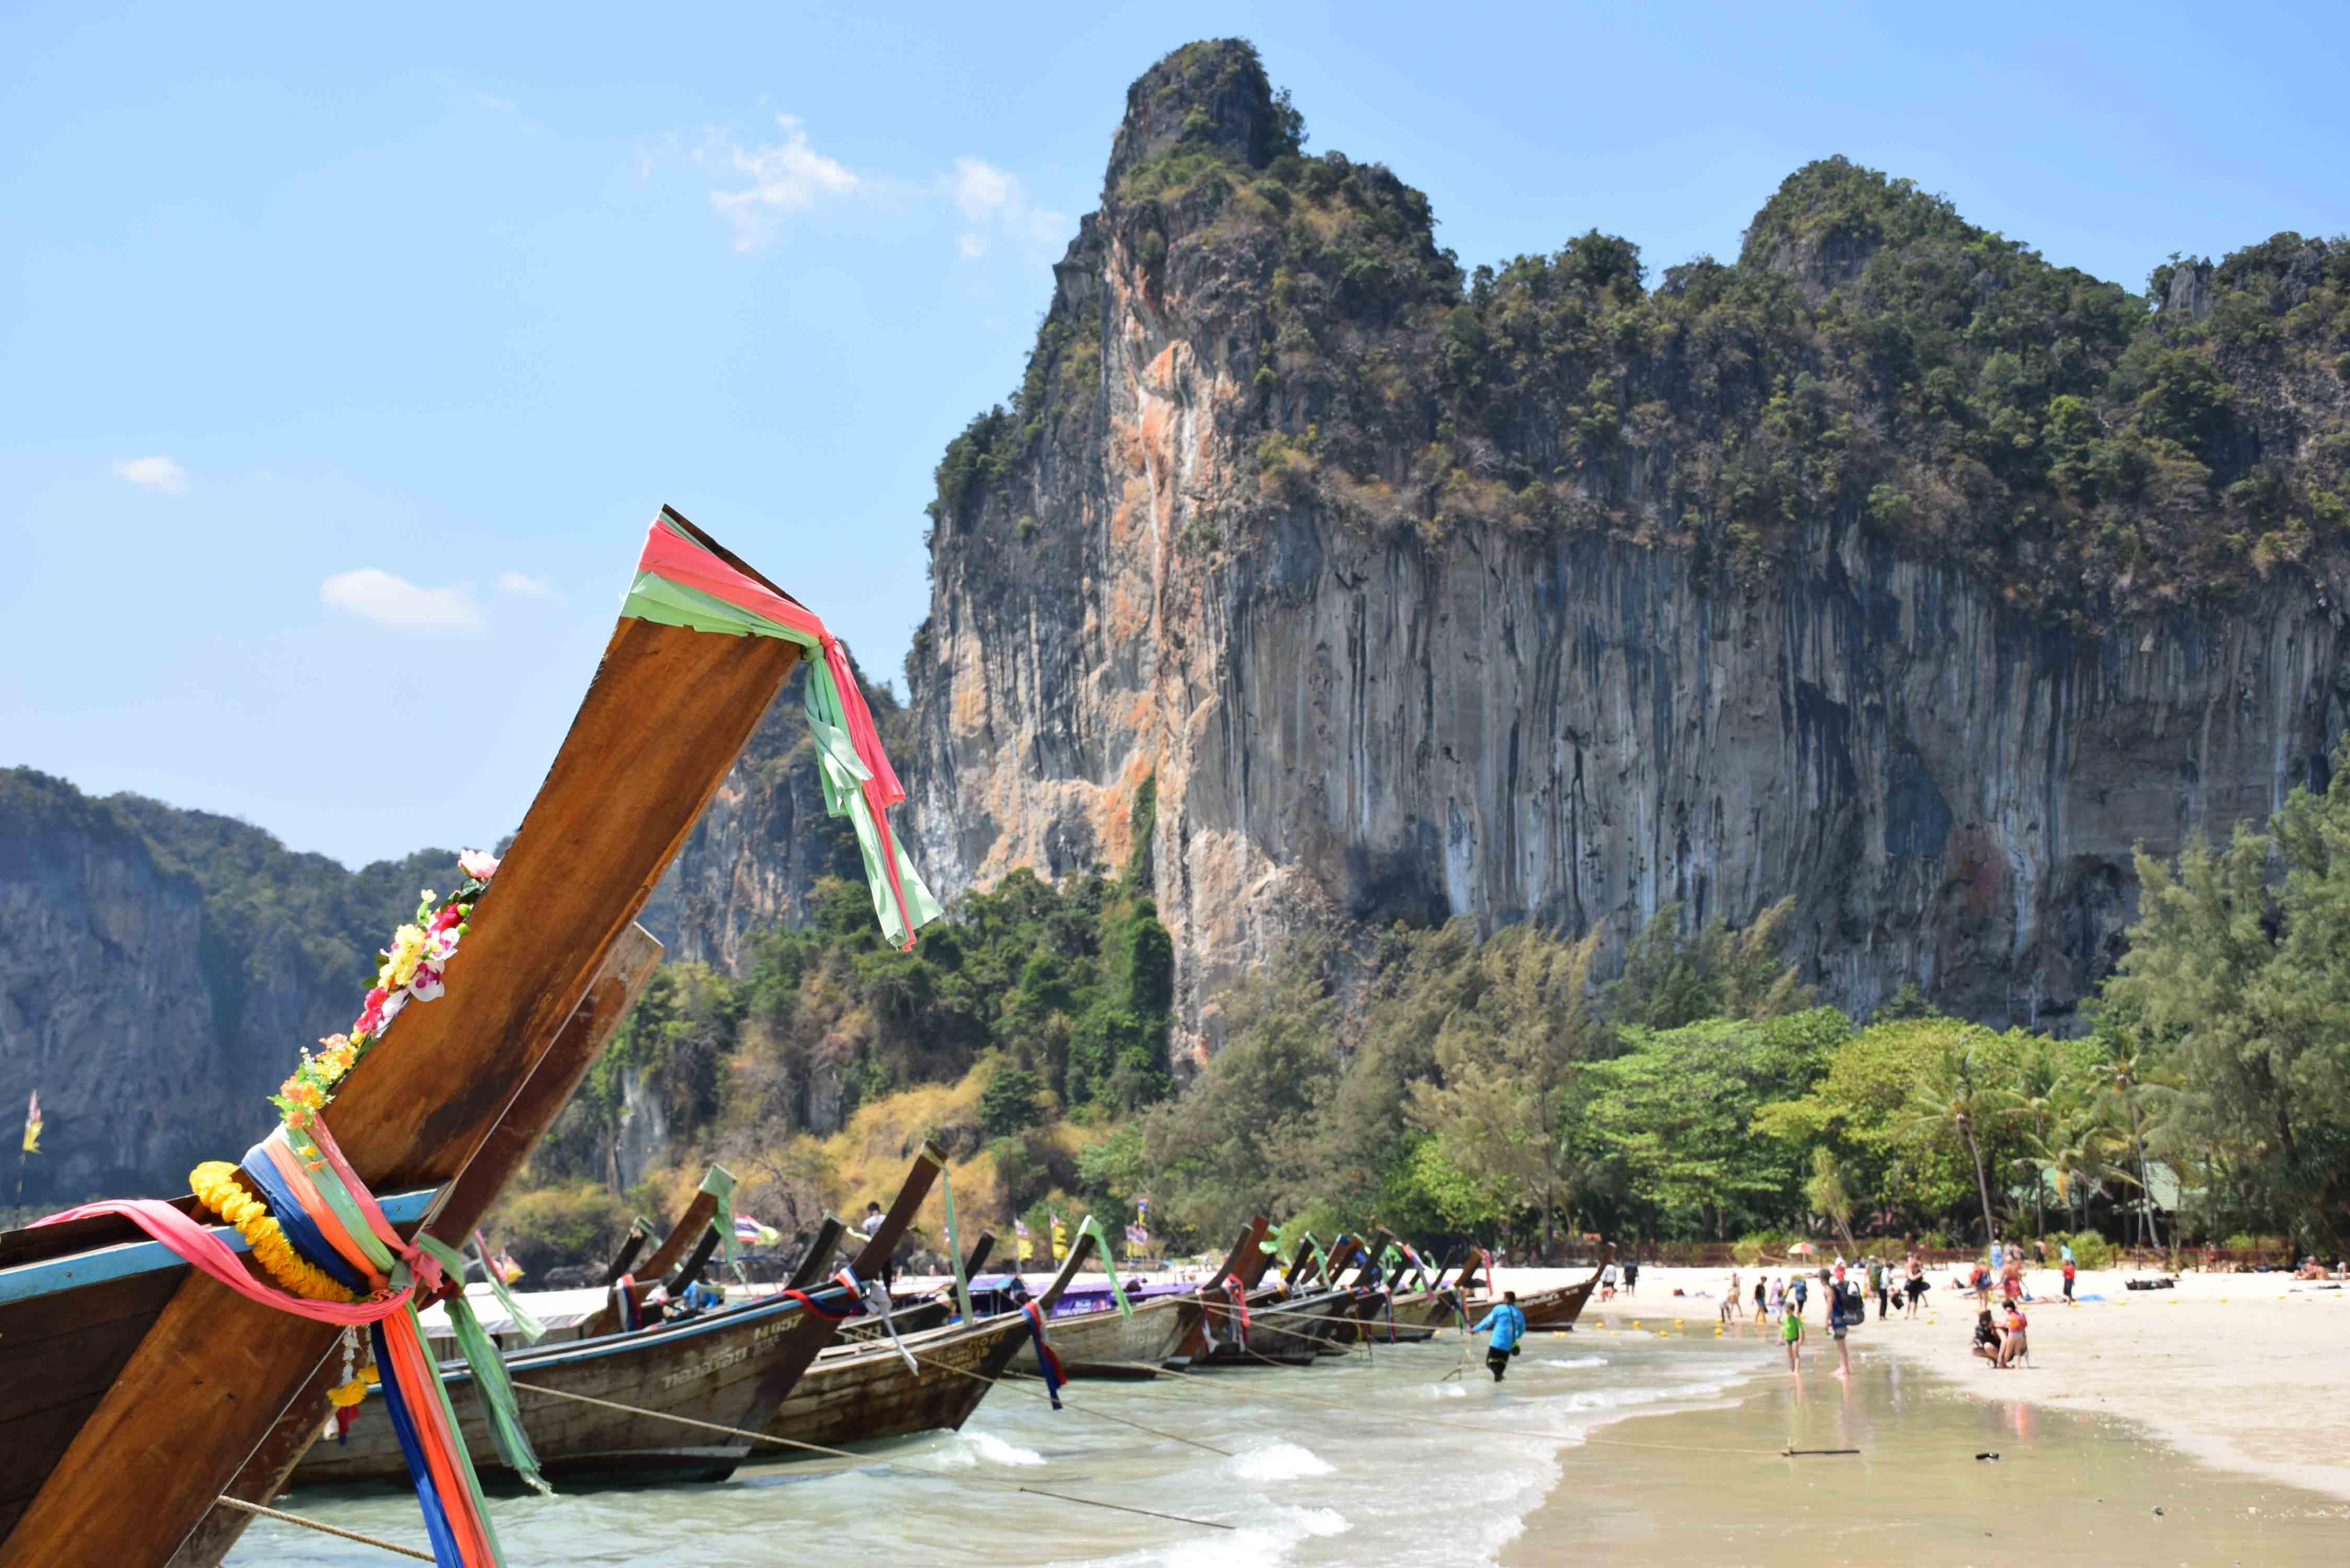 dicas de krabi - railay beach - hotel rayavadee - tailandia - lala rebelo